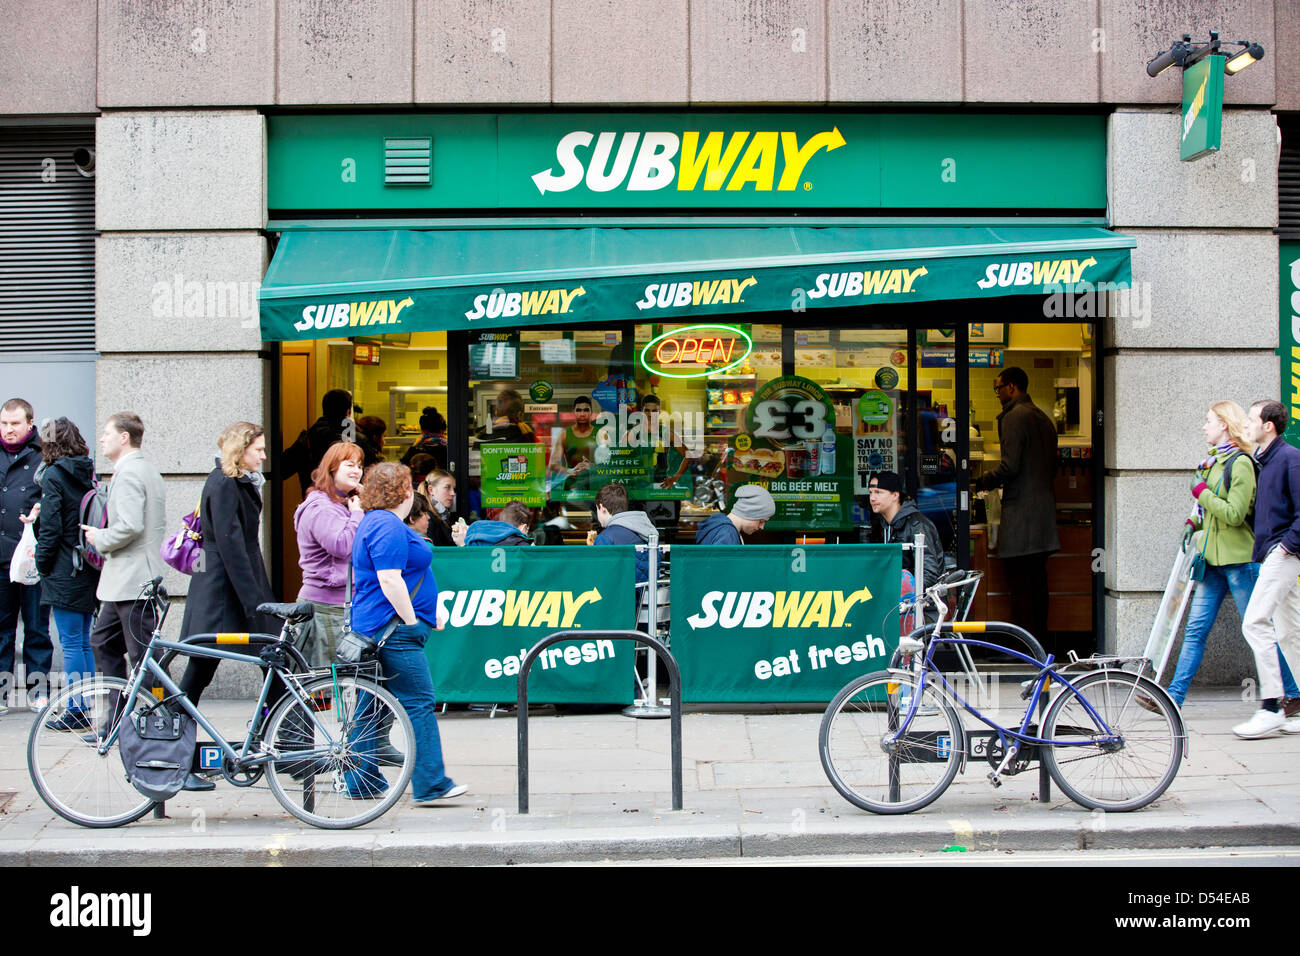 Subway sandwhich shop, London, United Kingdom - Stock Image